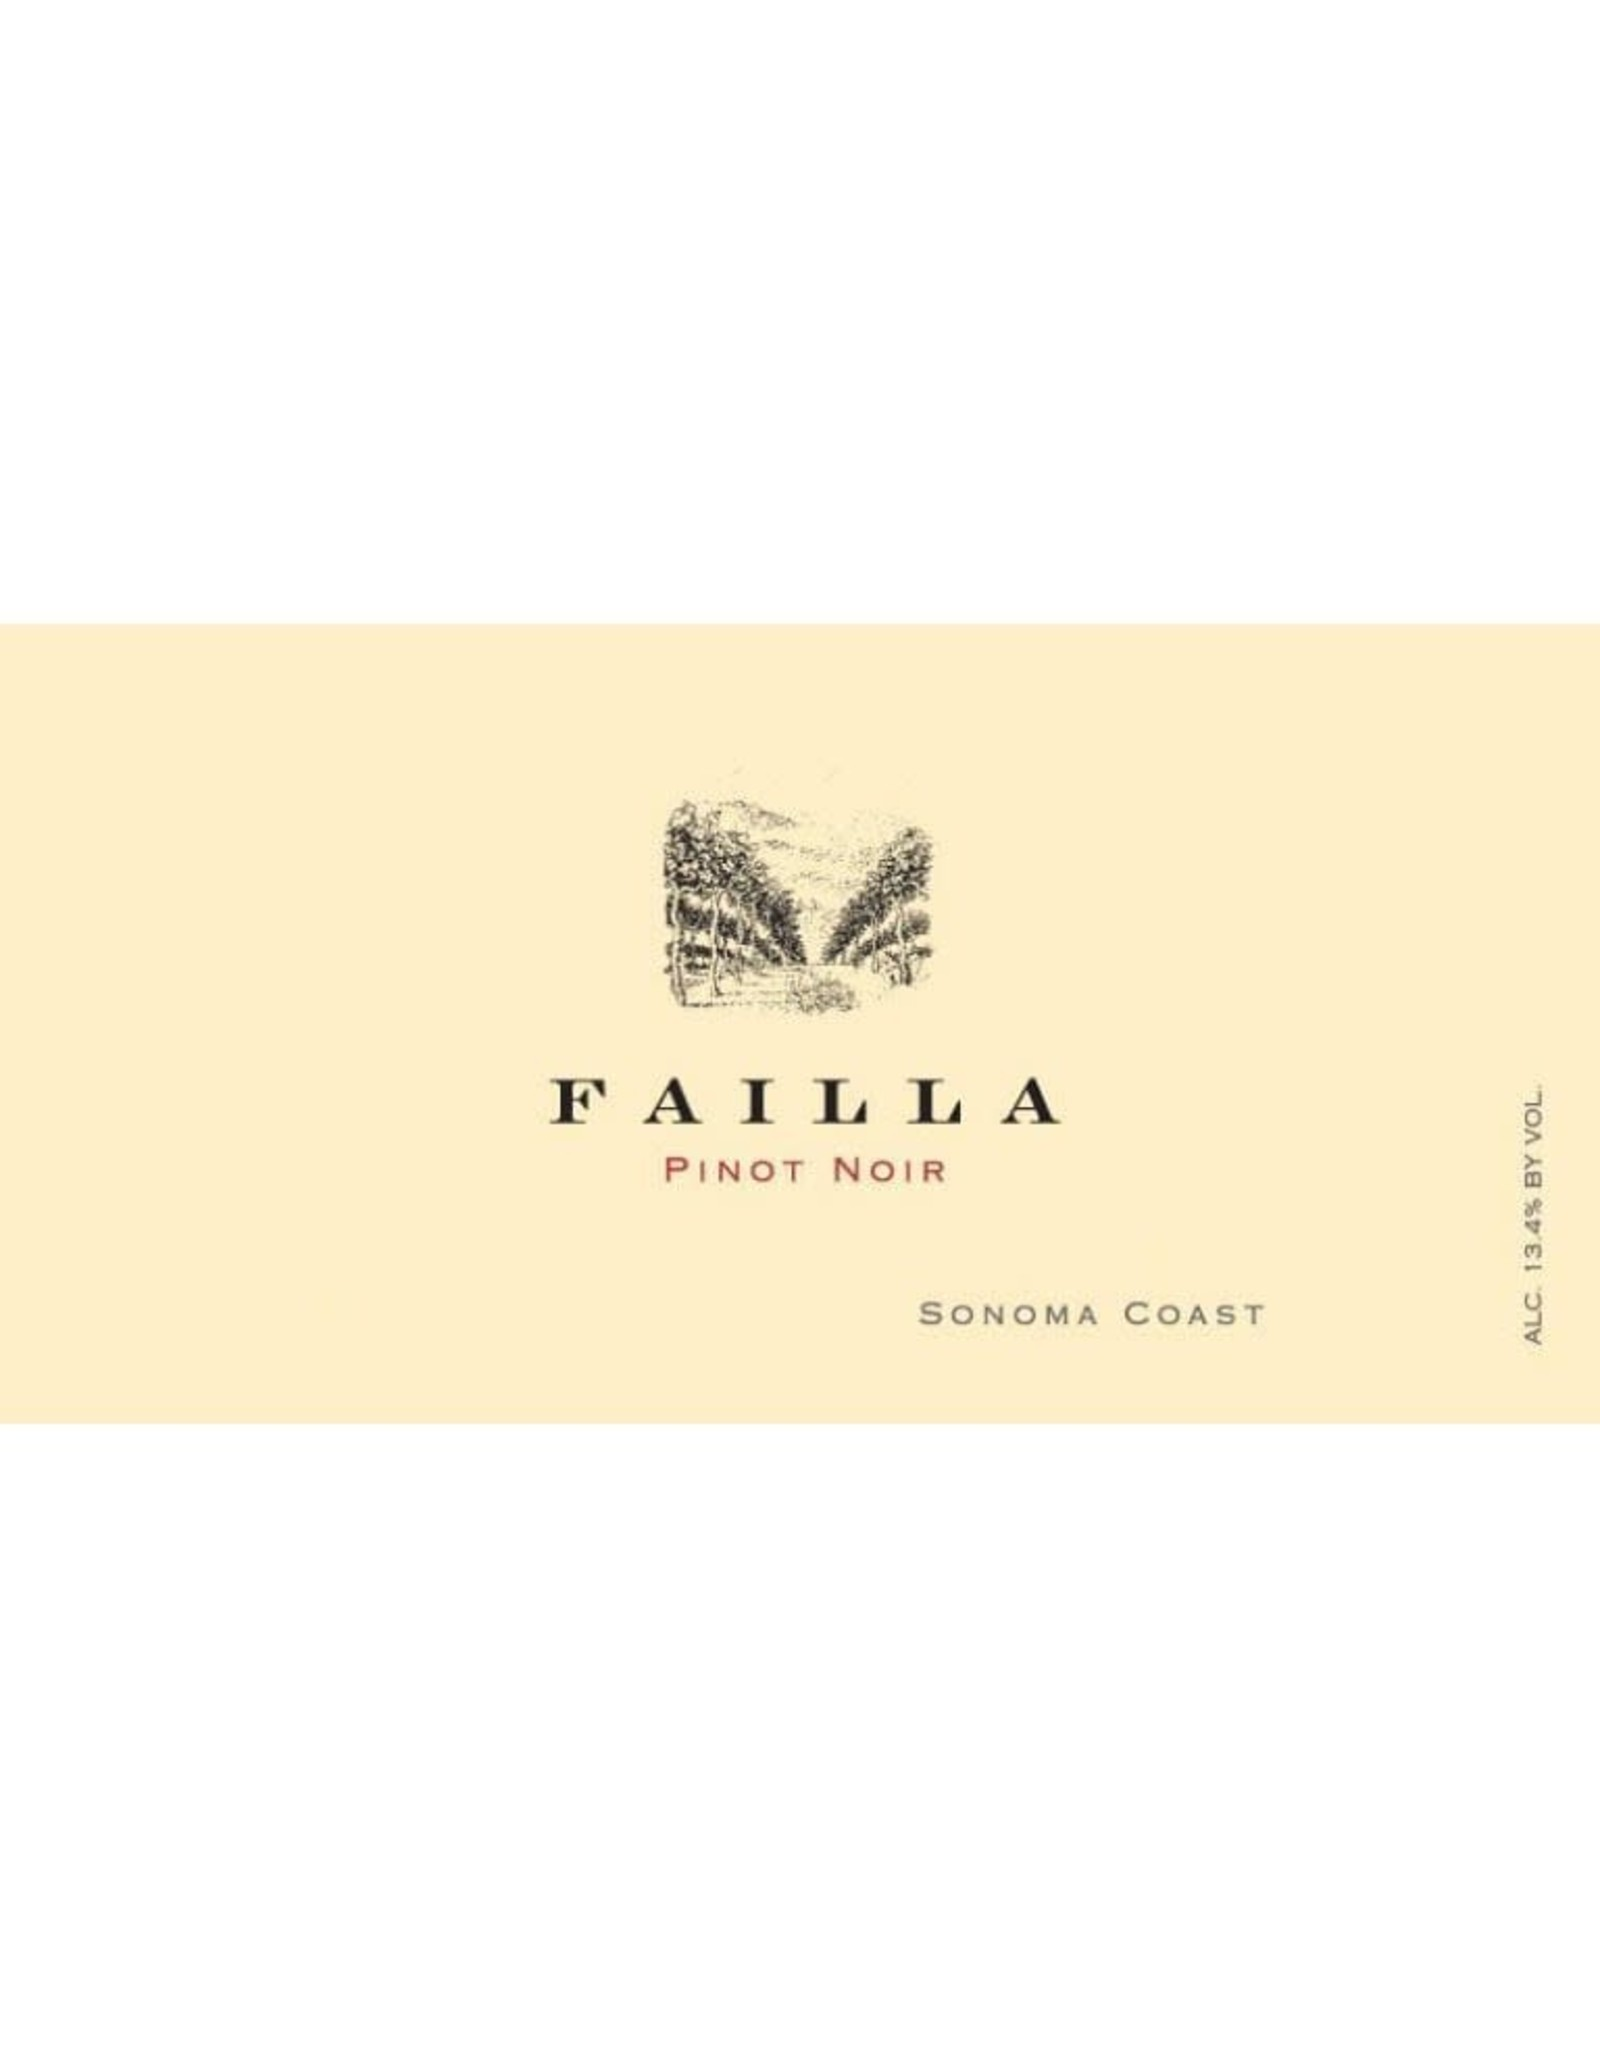 Faila Failla Pinot Noir, Sonoma Coast 2018